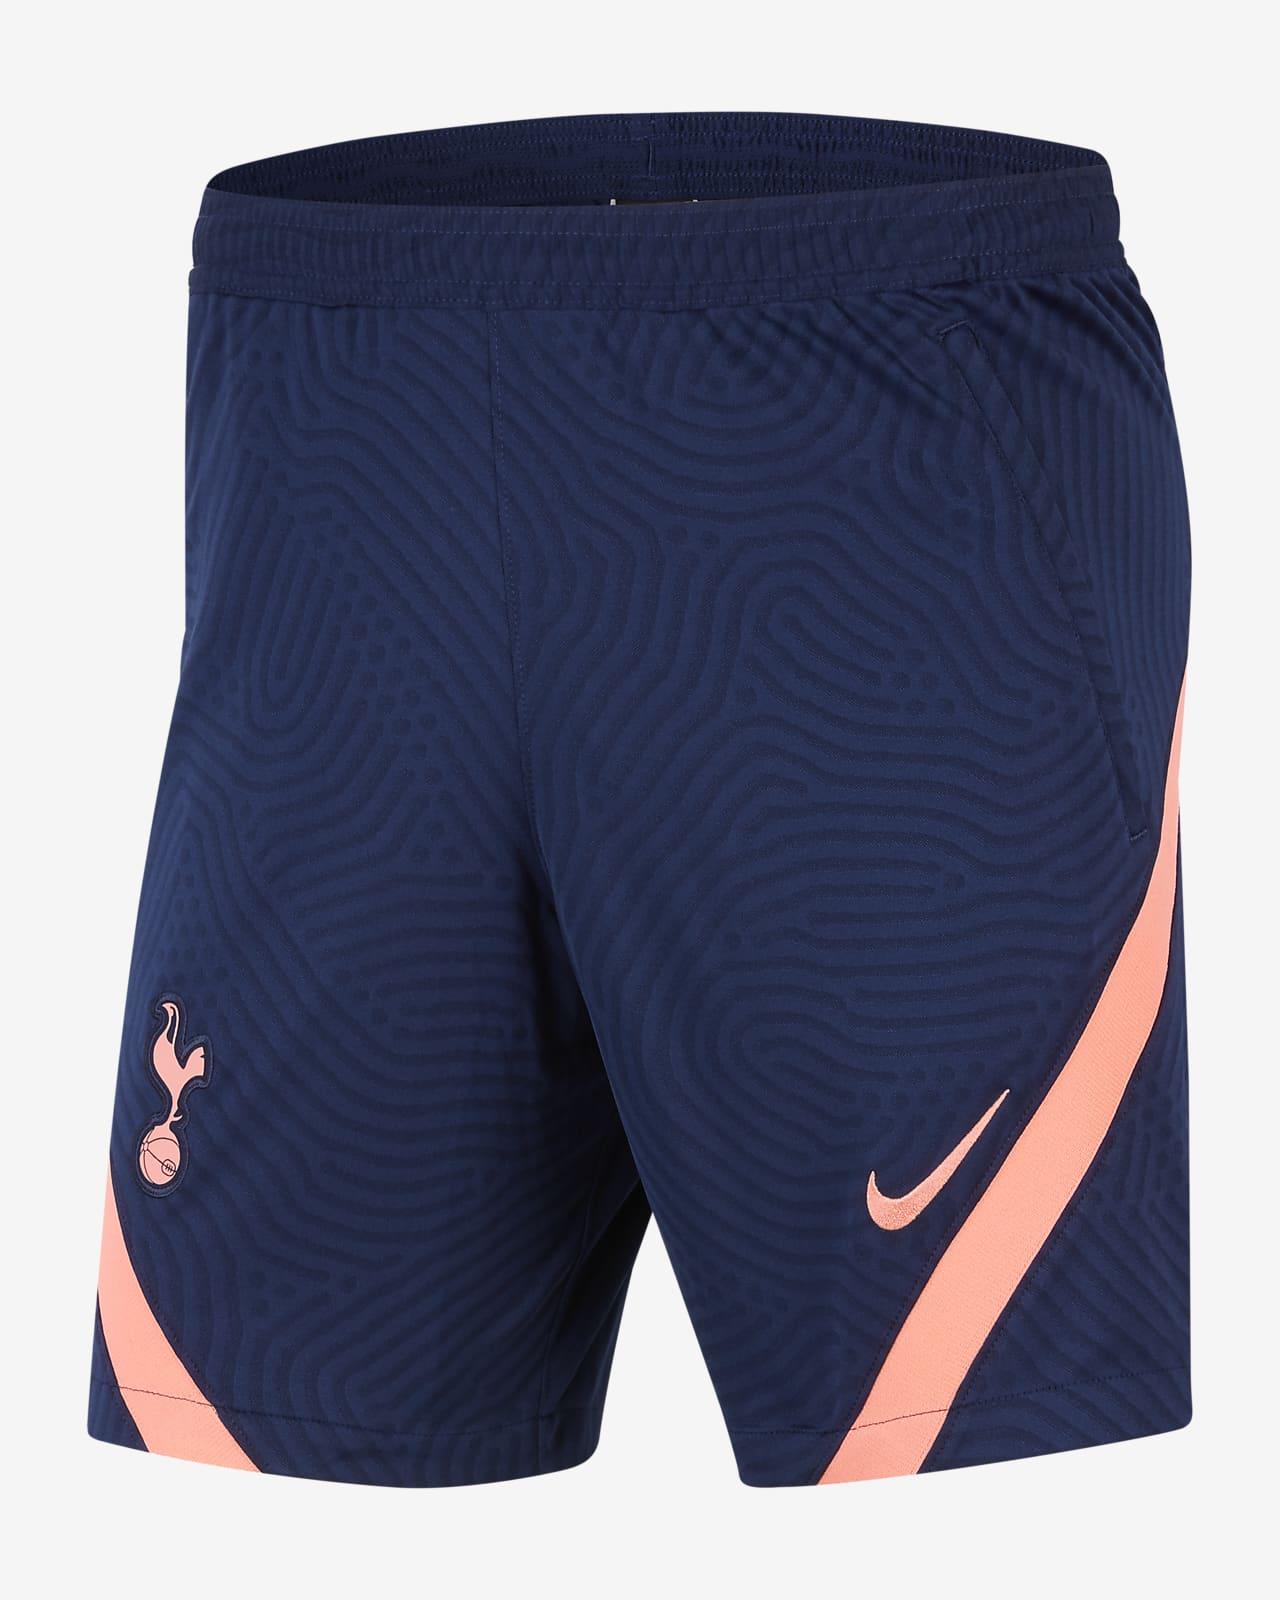 Tottenham Hotspur Strike Men's Football Shorts